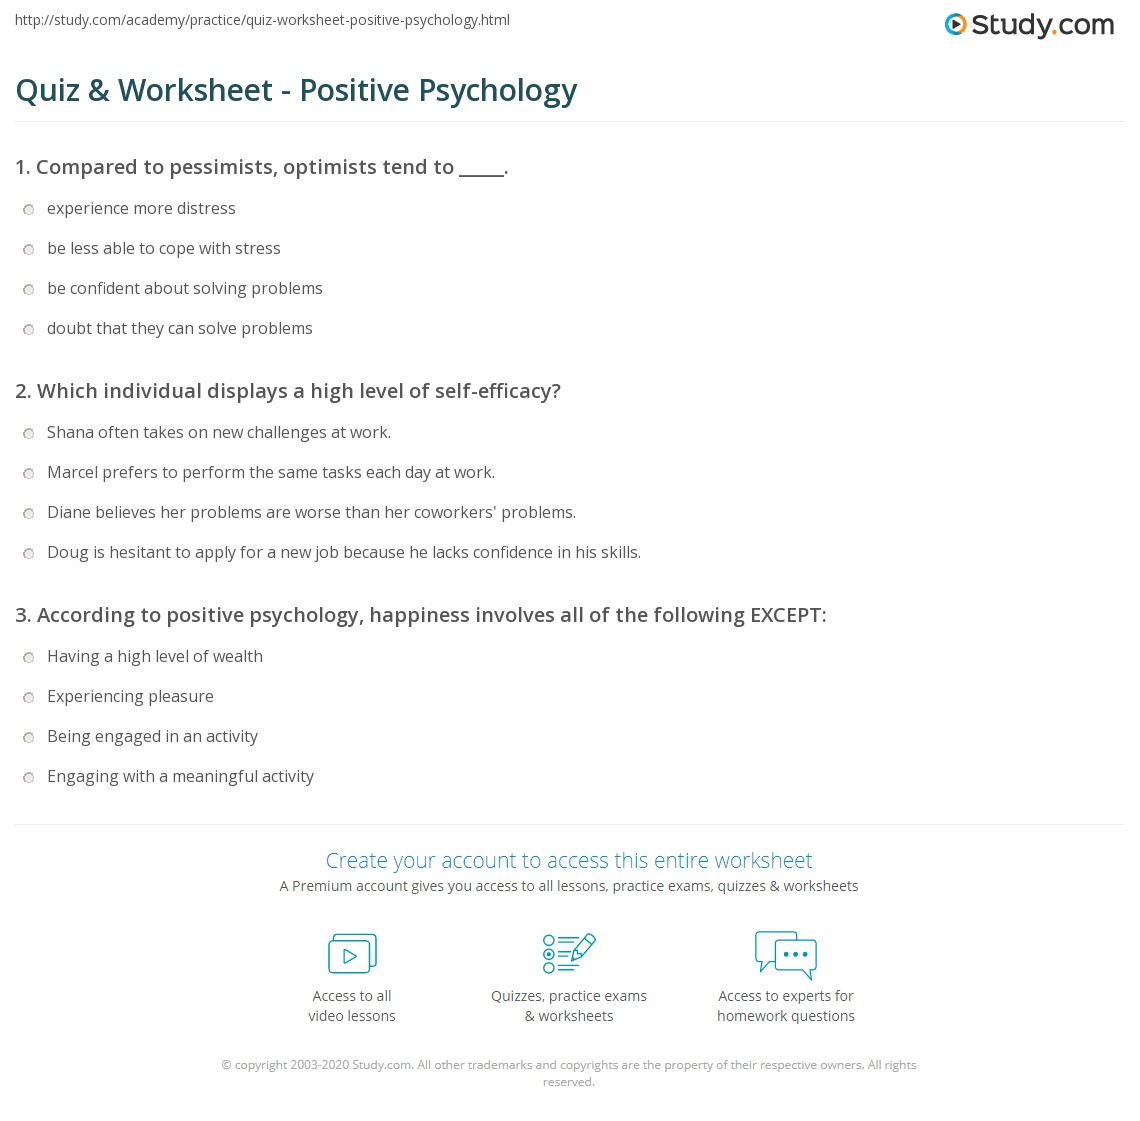 worksheet Positivity Worksheets quiz worksheet positive psychology study com print optimism self efficacy happiness worksheet